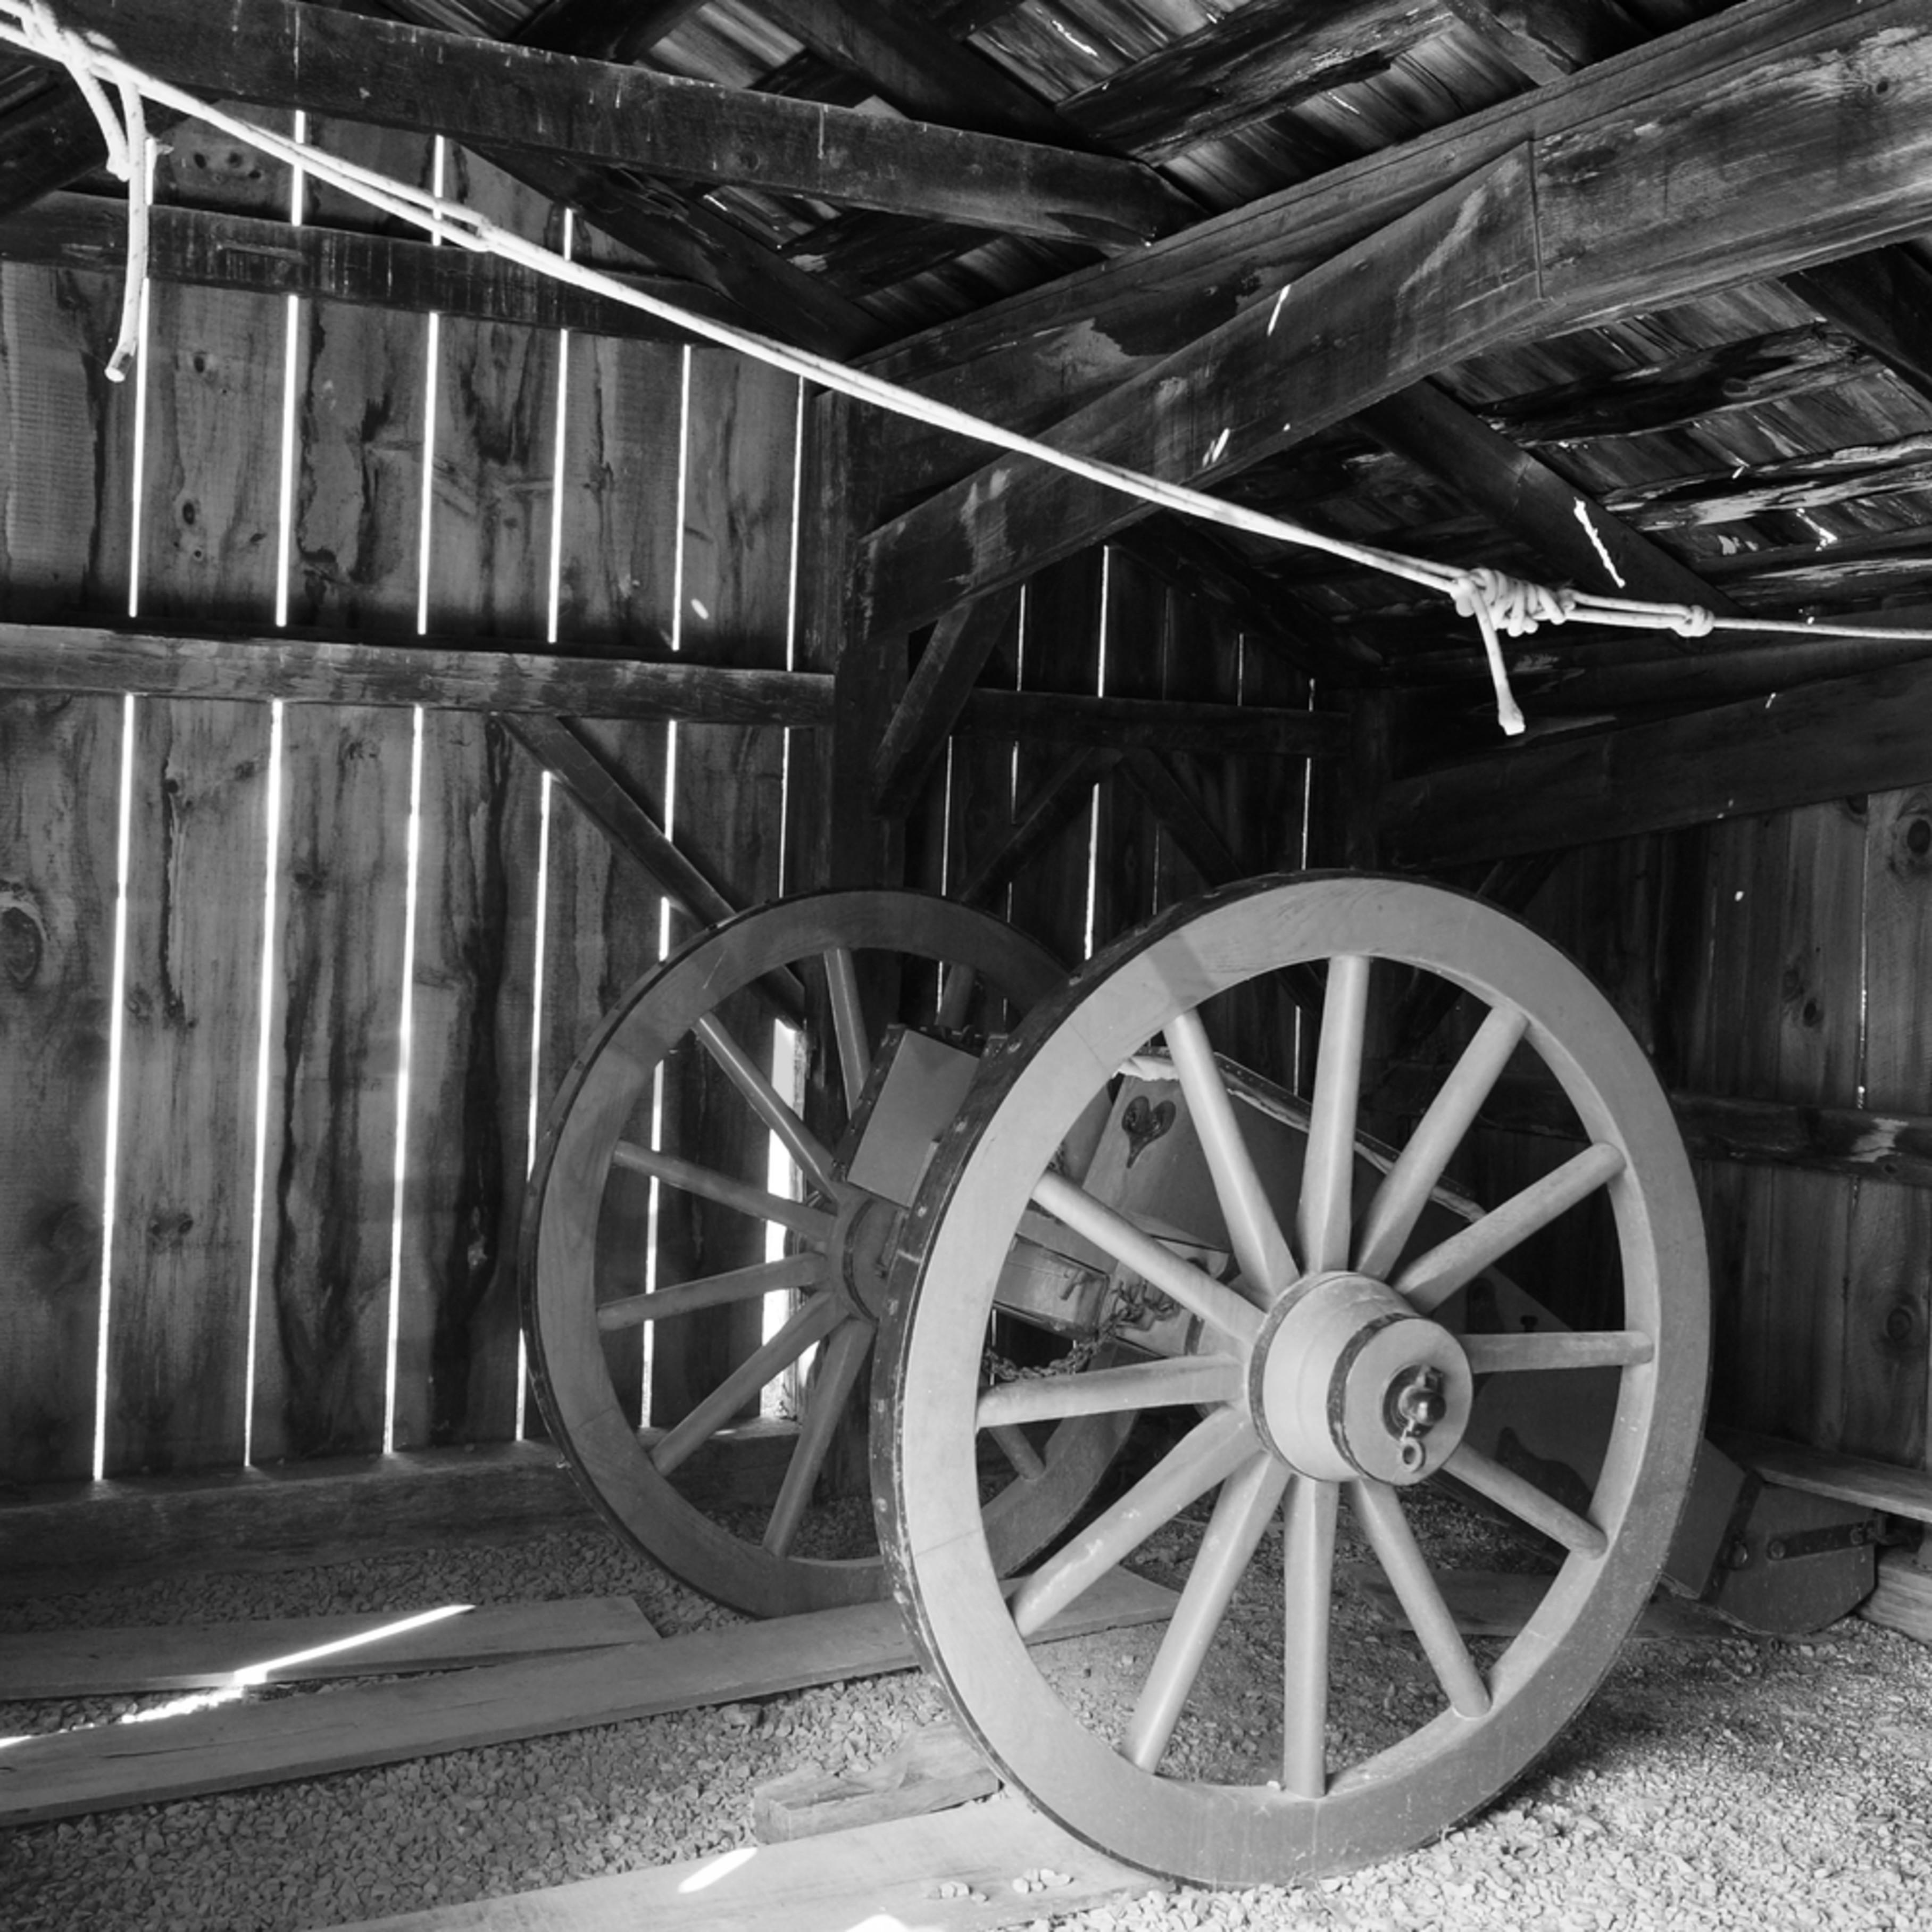 The cannon wagon szebxo